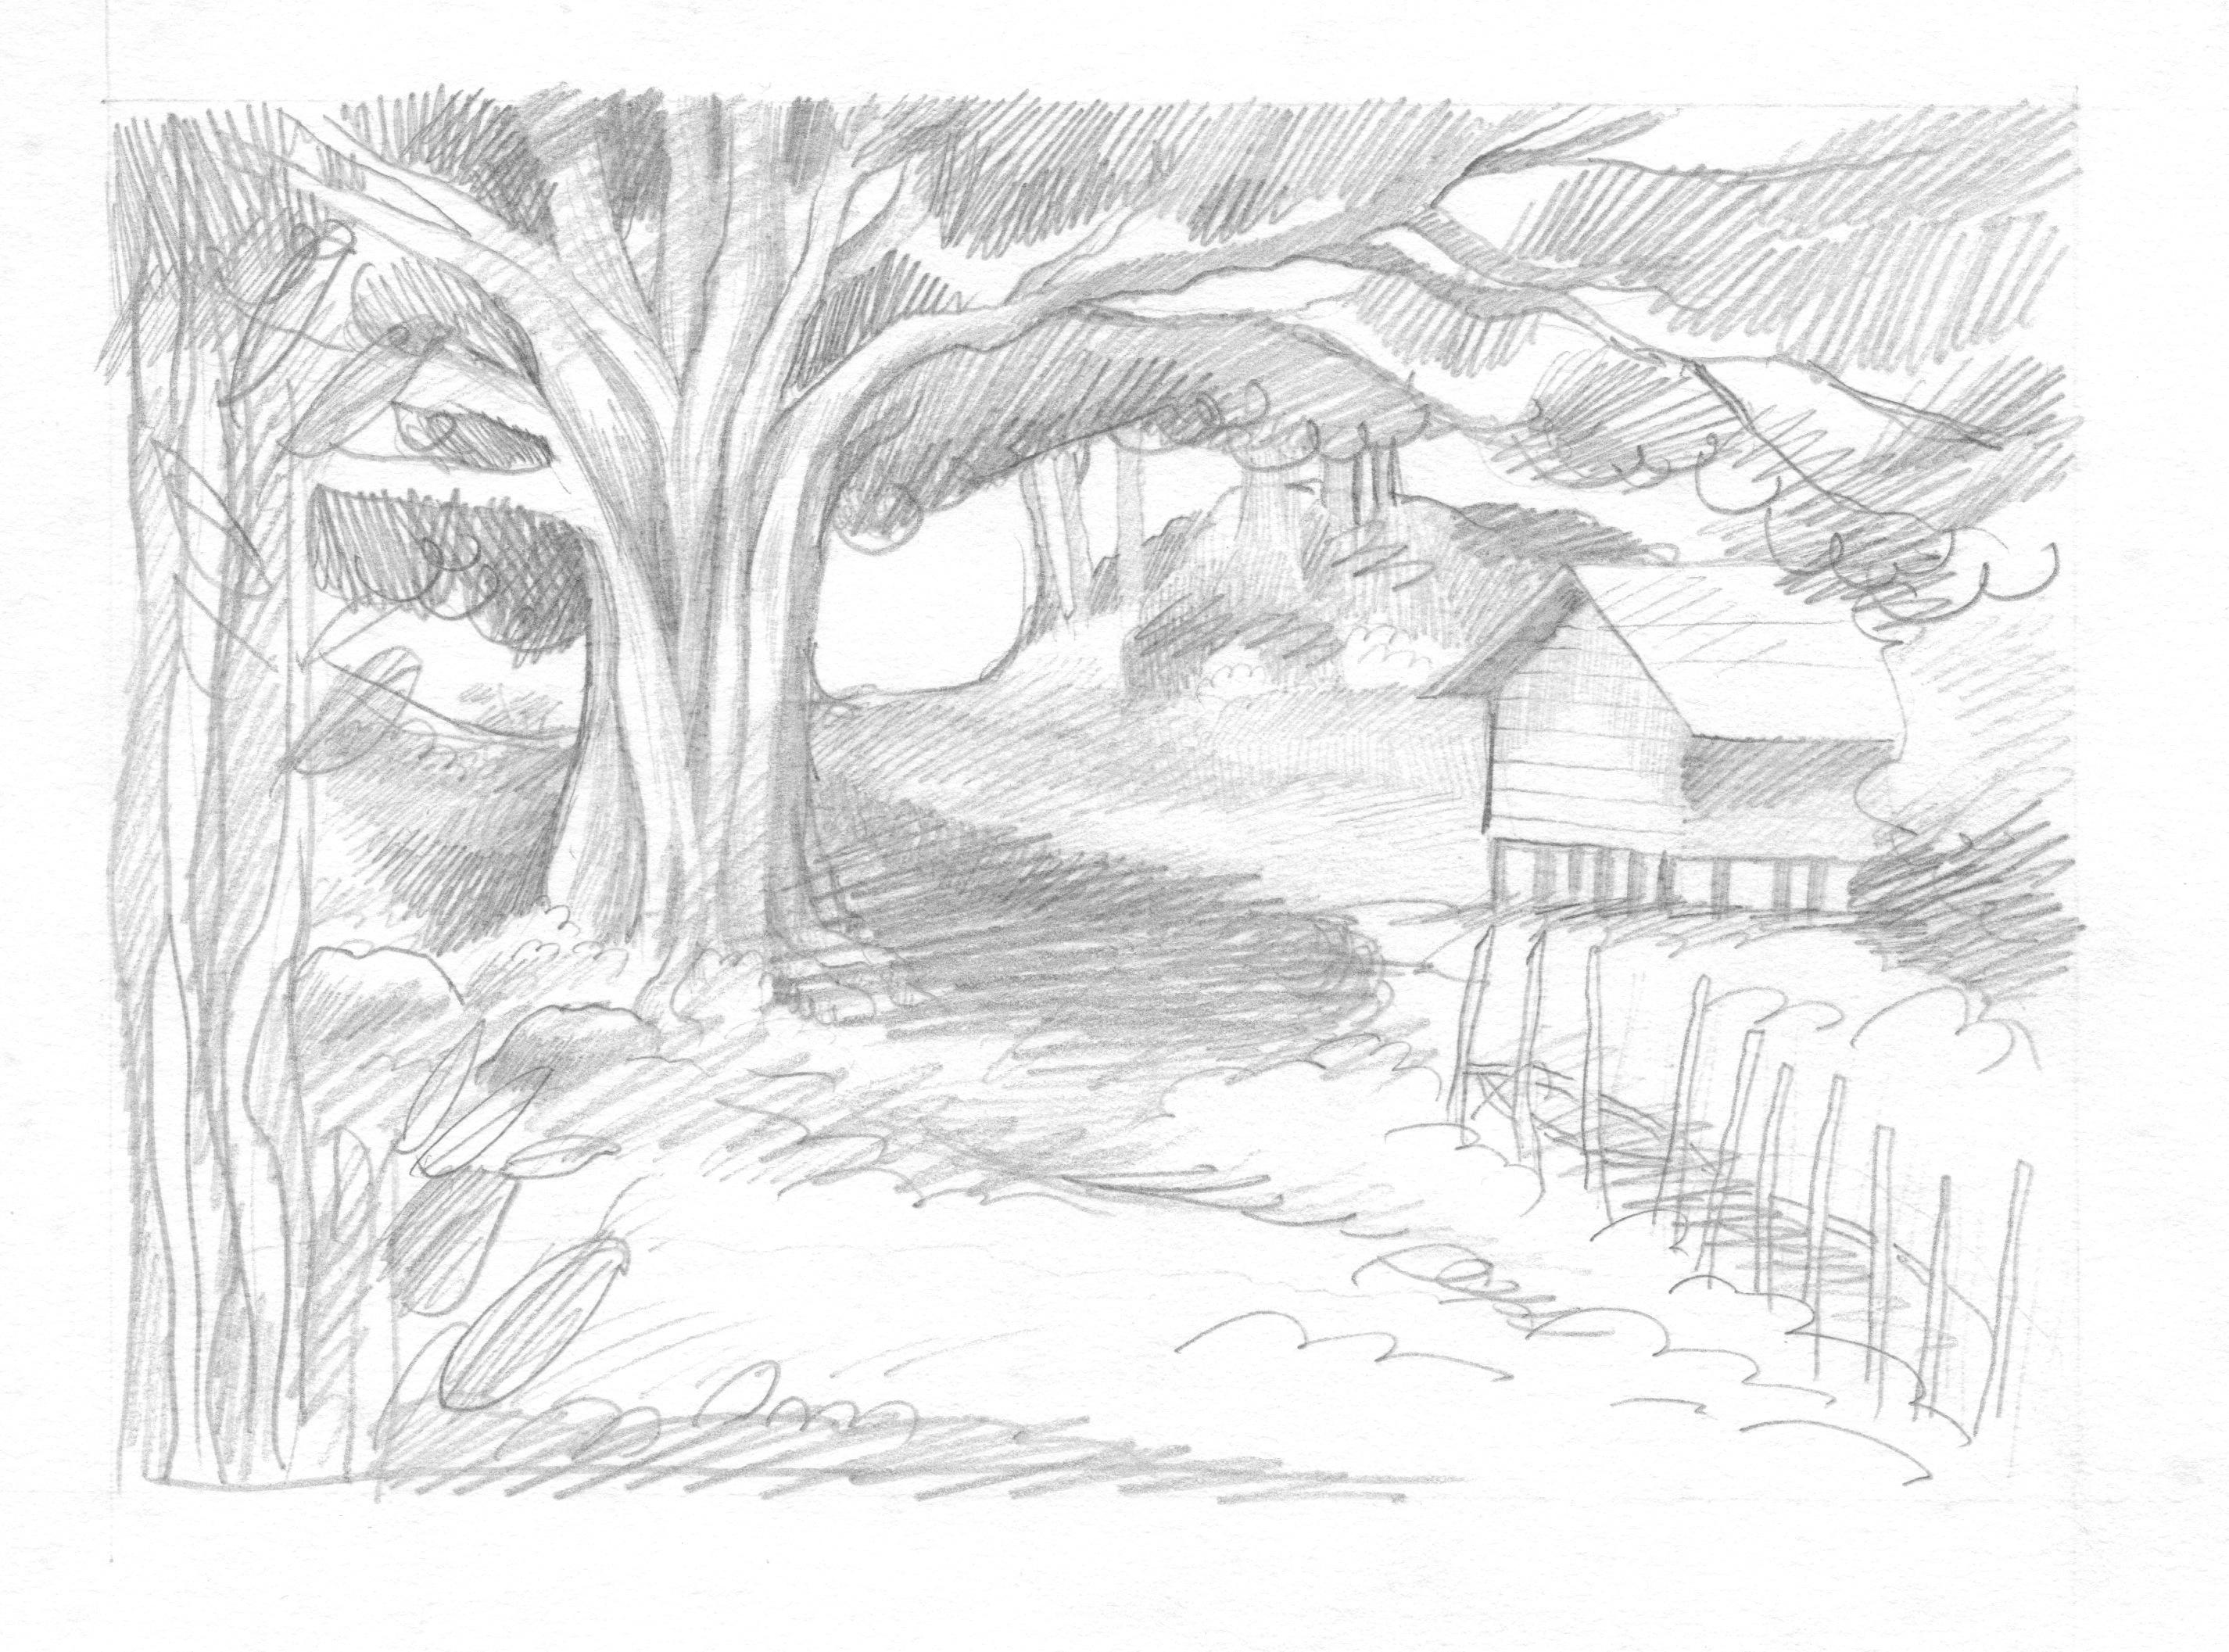 Drawn see Method See: Drawing Drawn Ethnographic